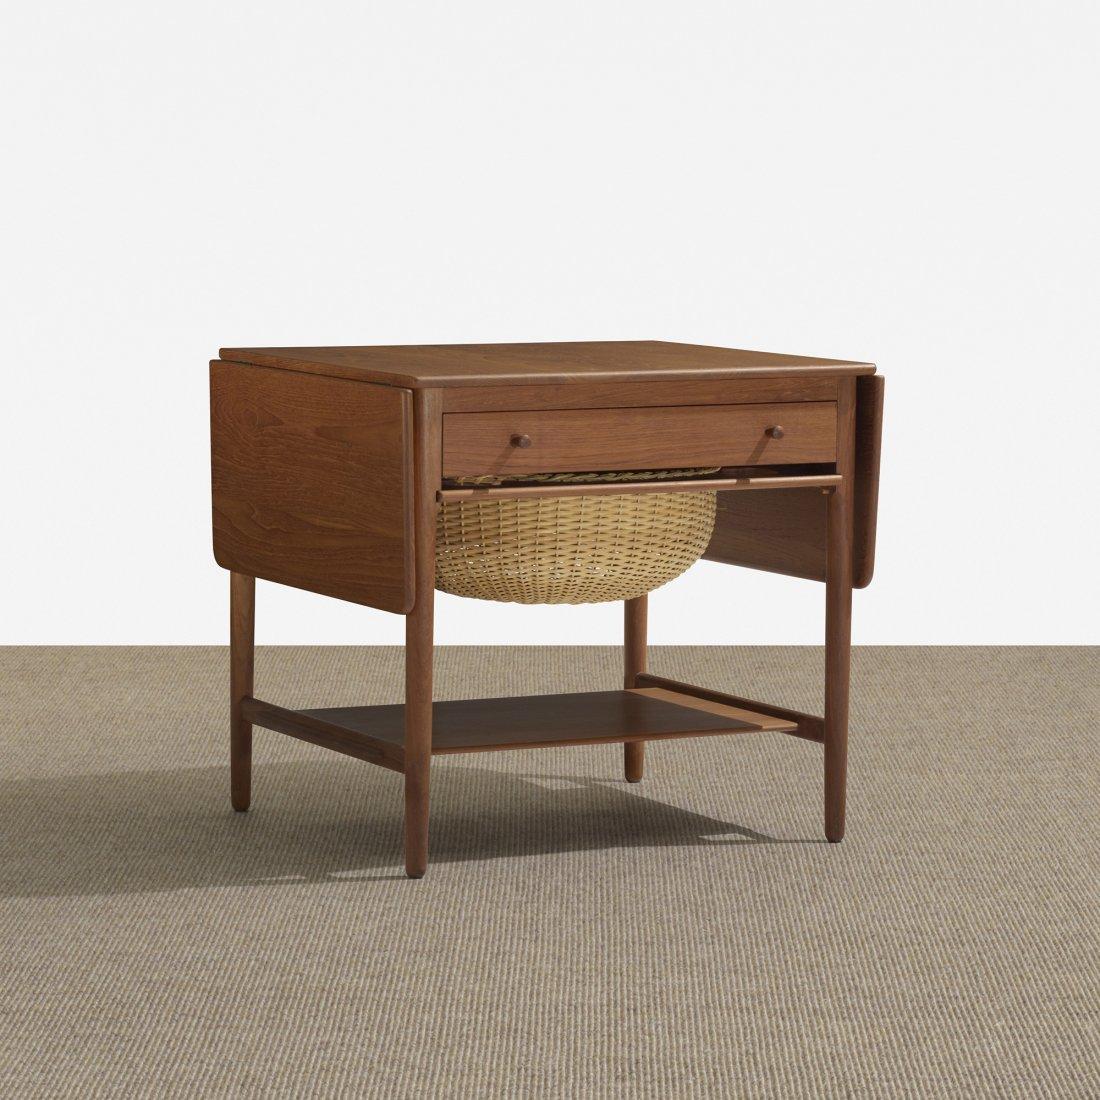 120: Hans Wegner sewing table, model AT 33